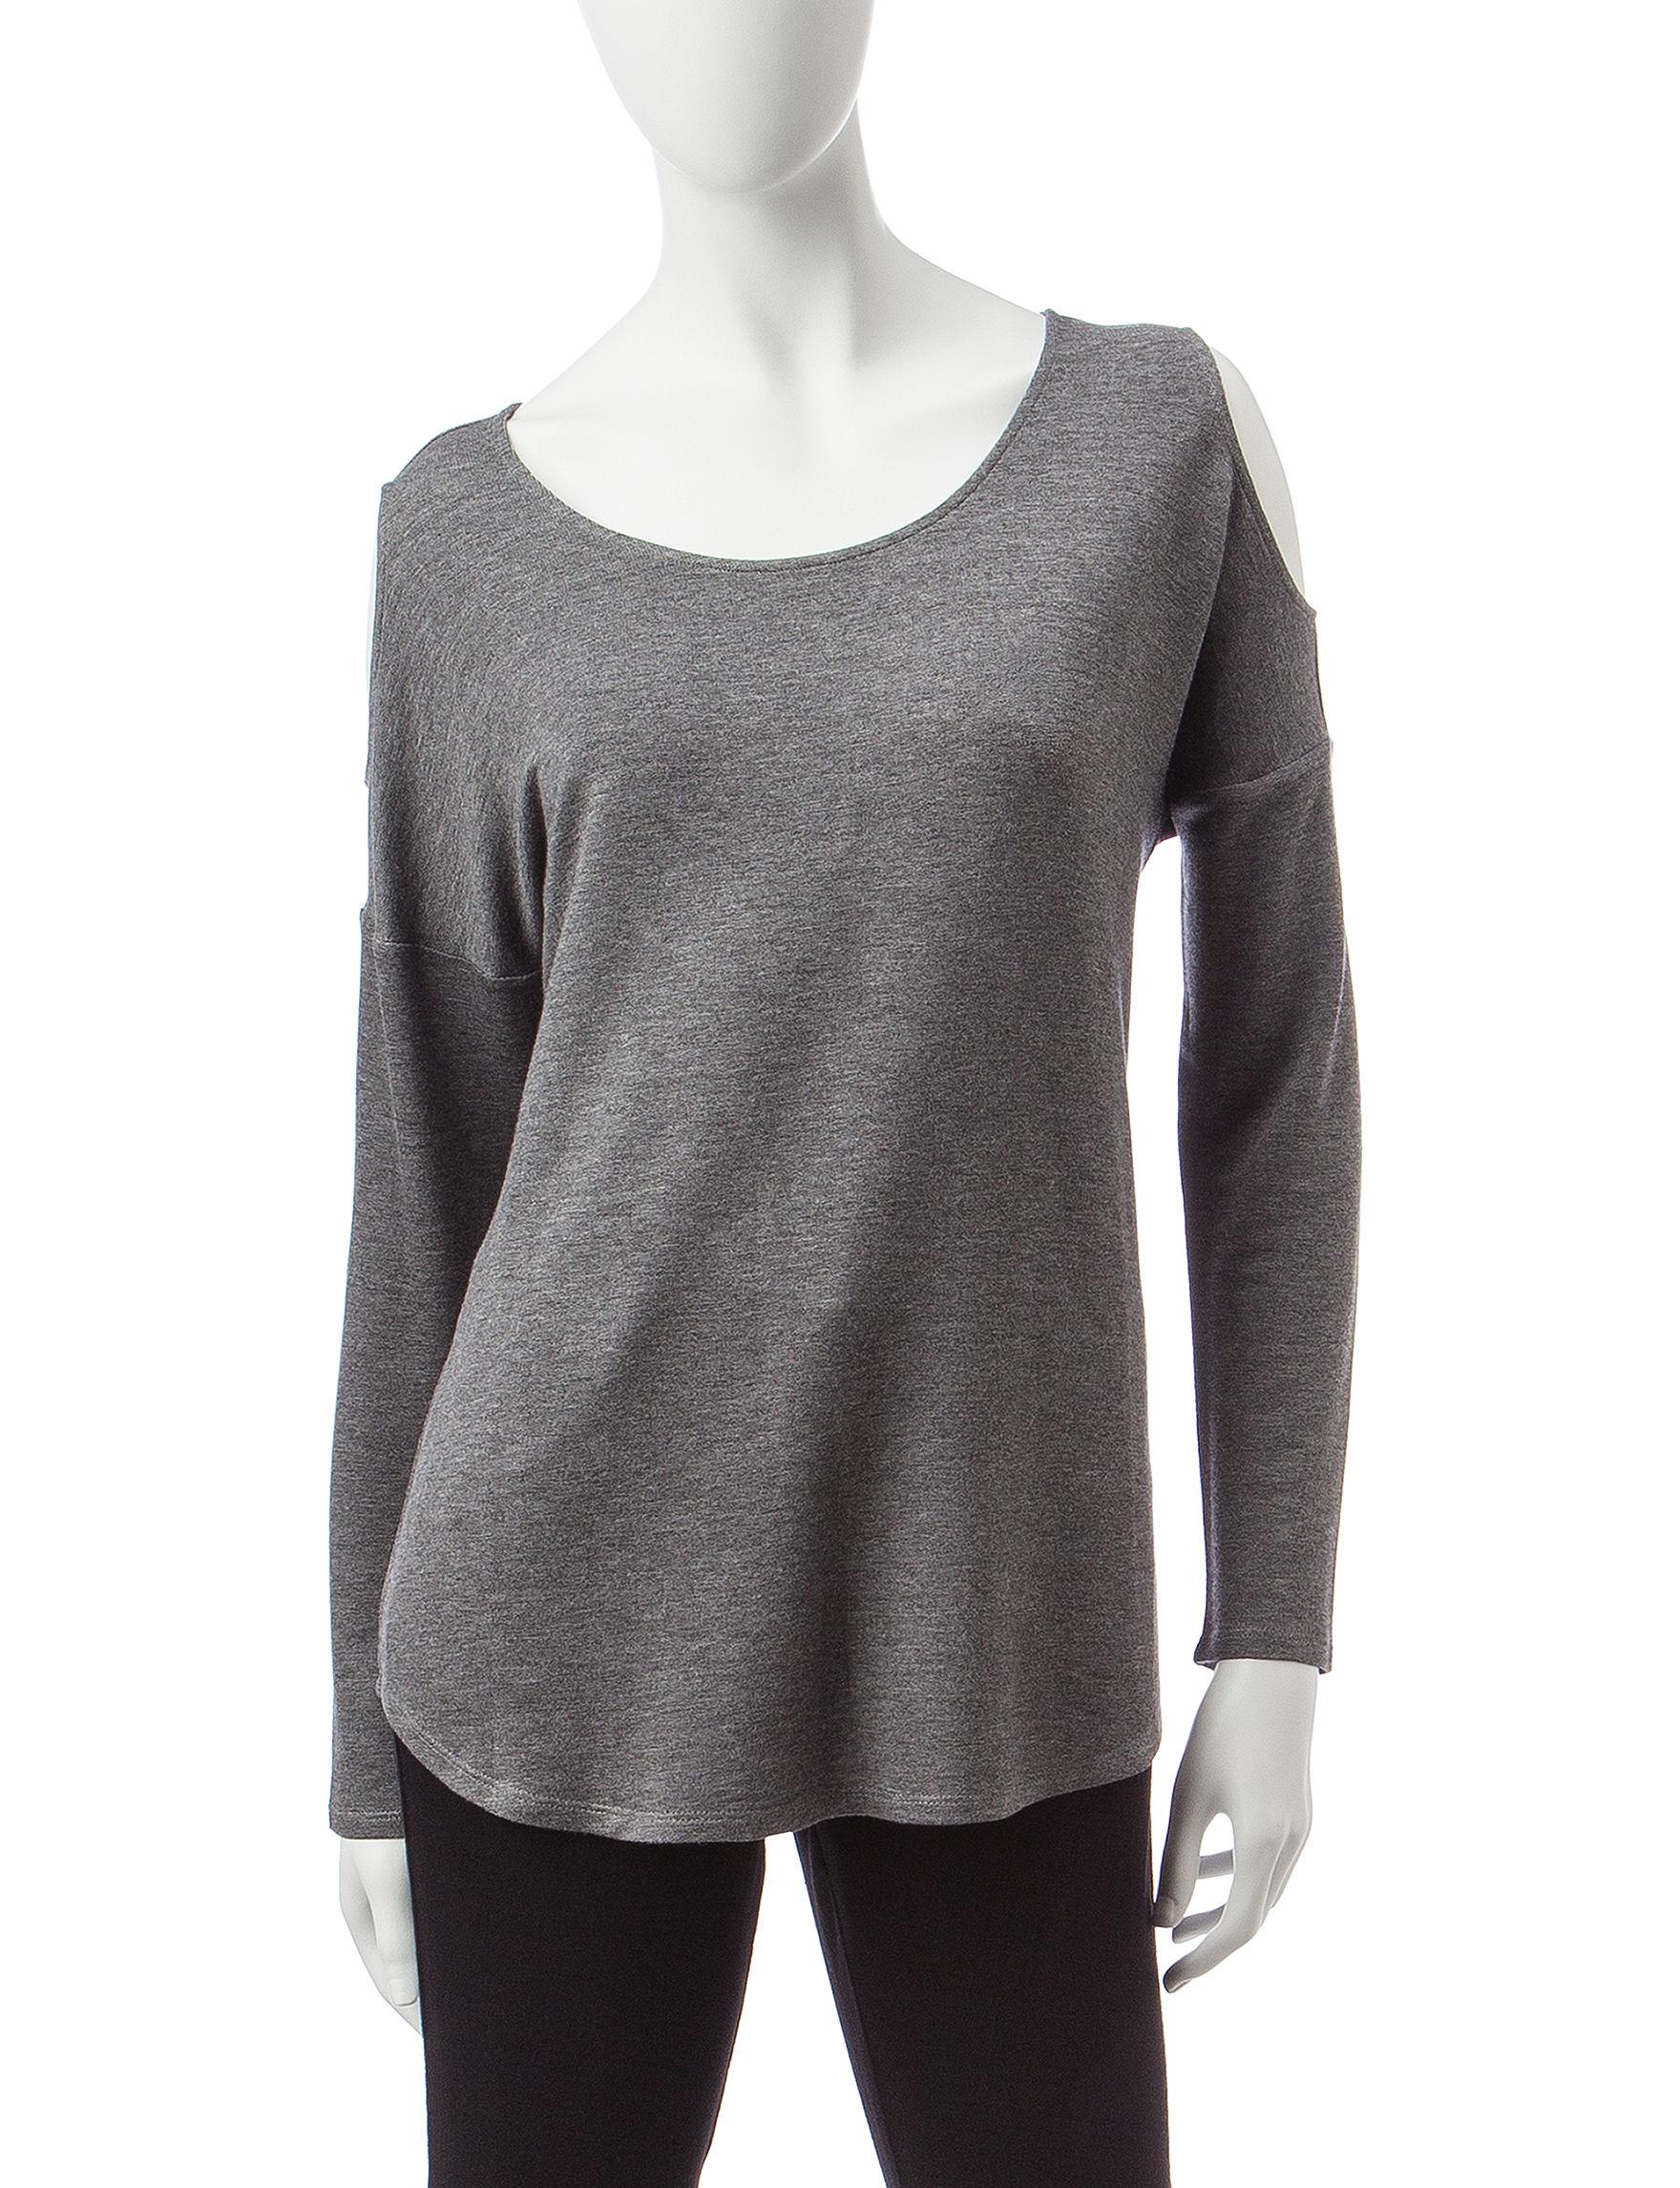 Signature Studio Charcoal Shirts & Blouses Tees & Tanks